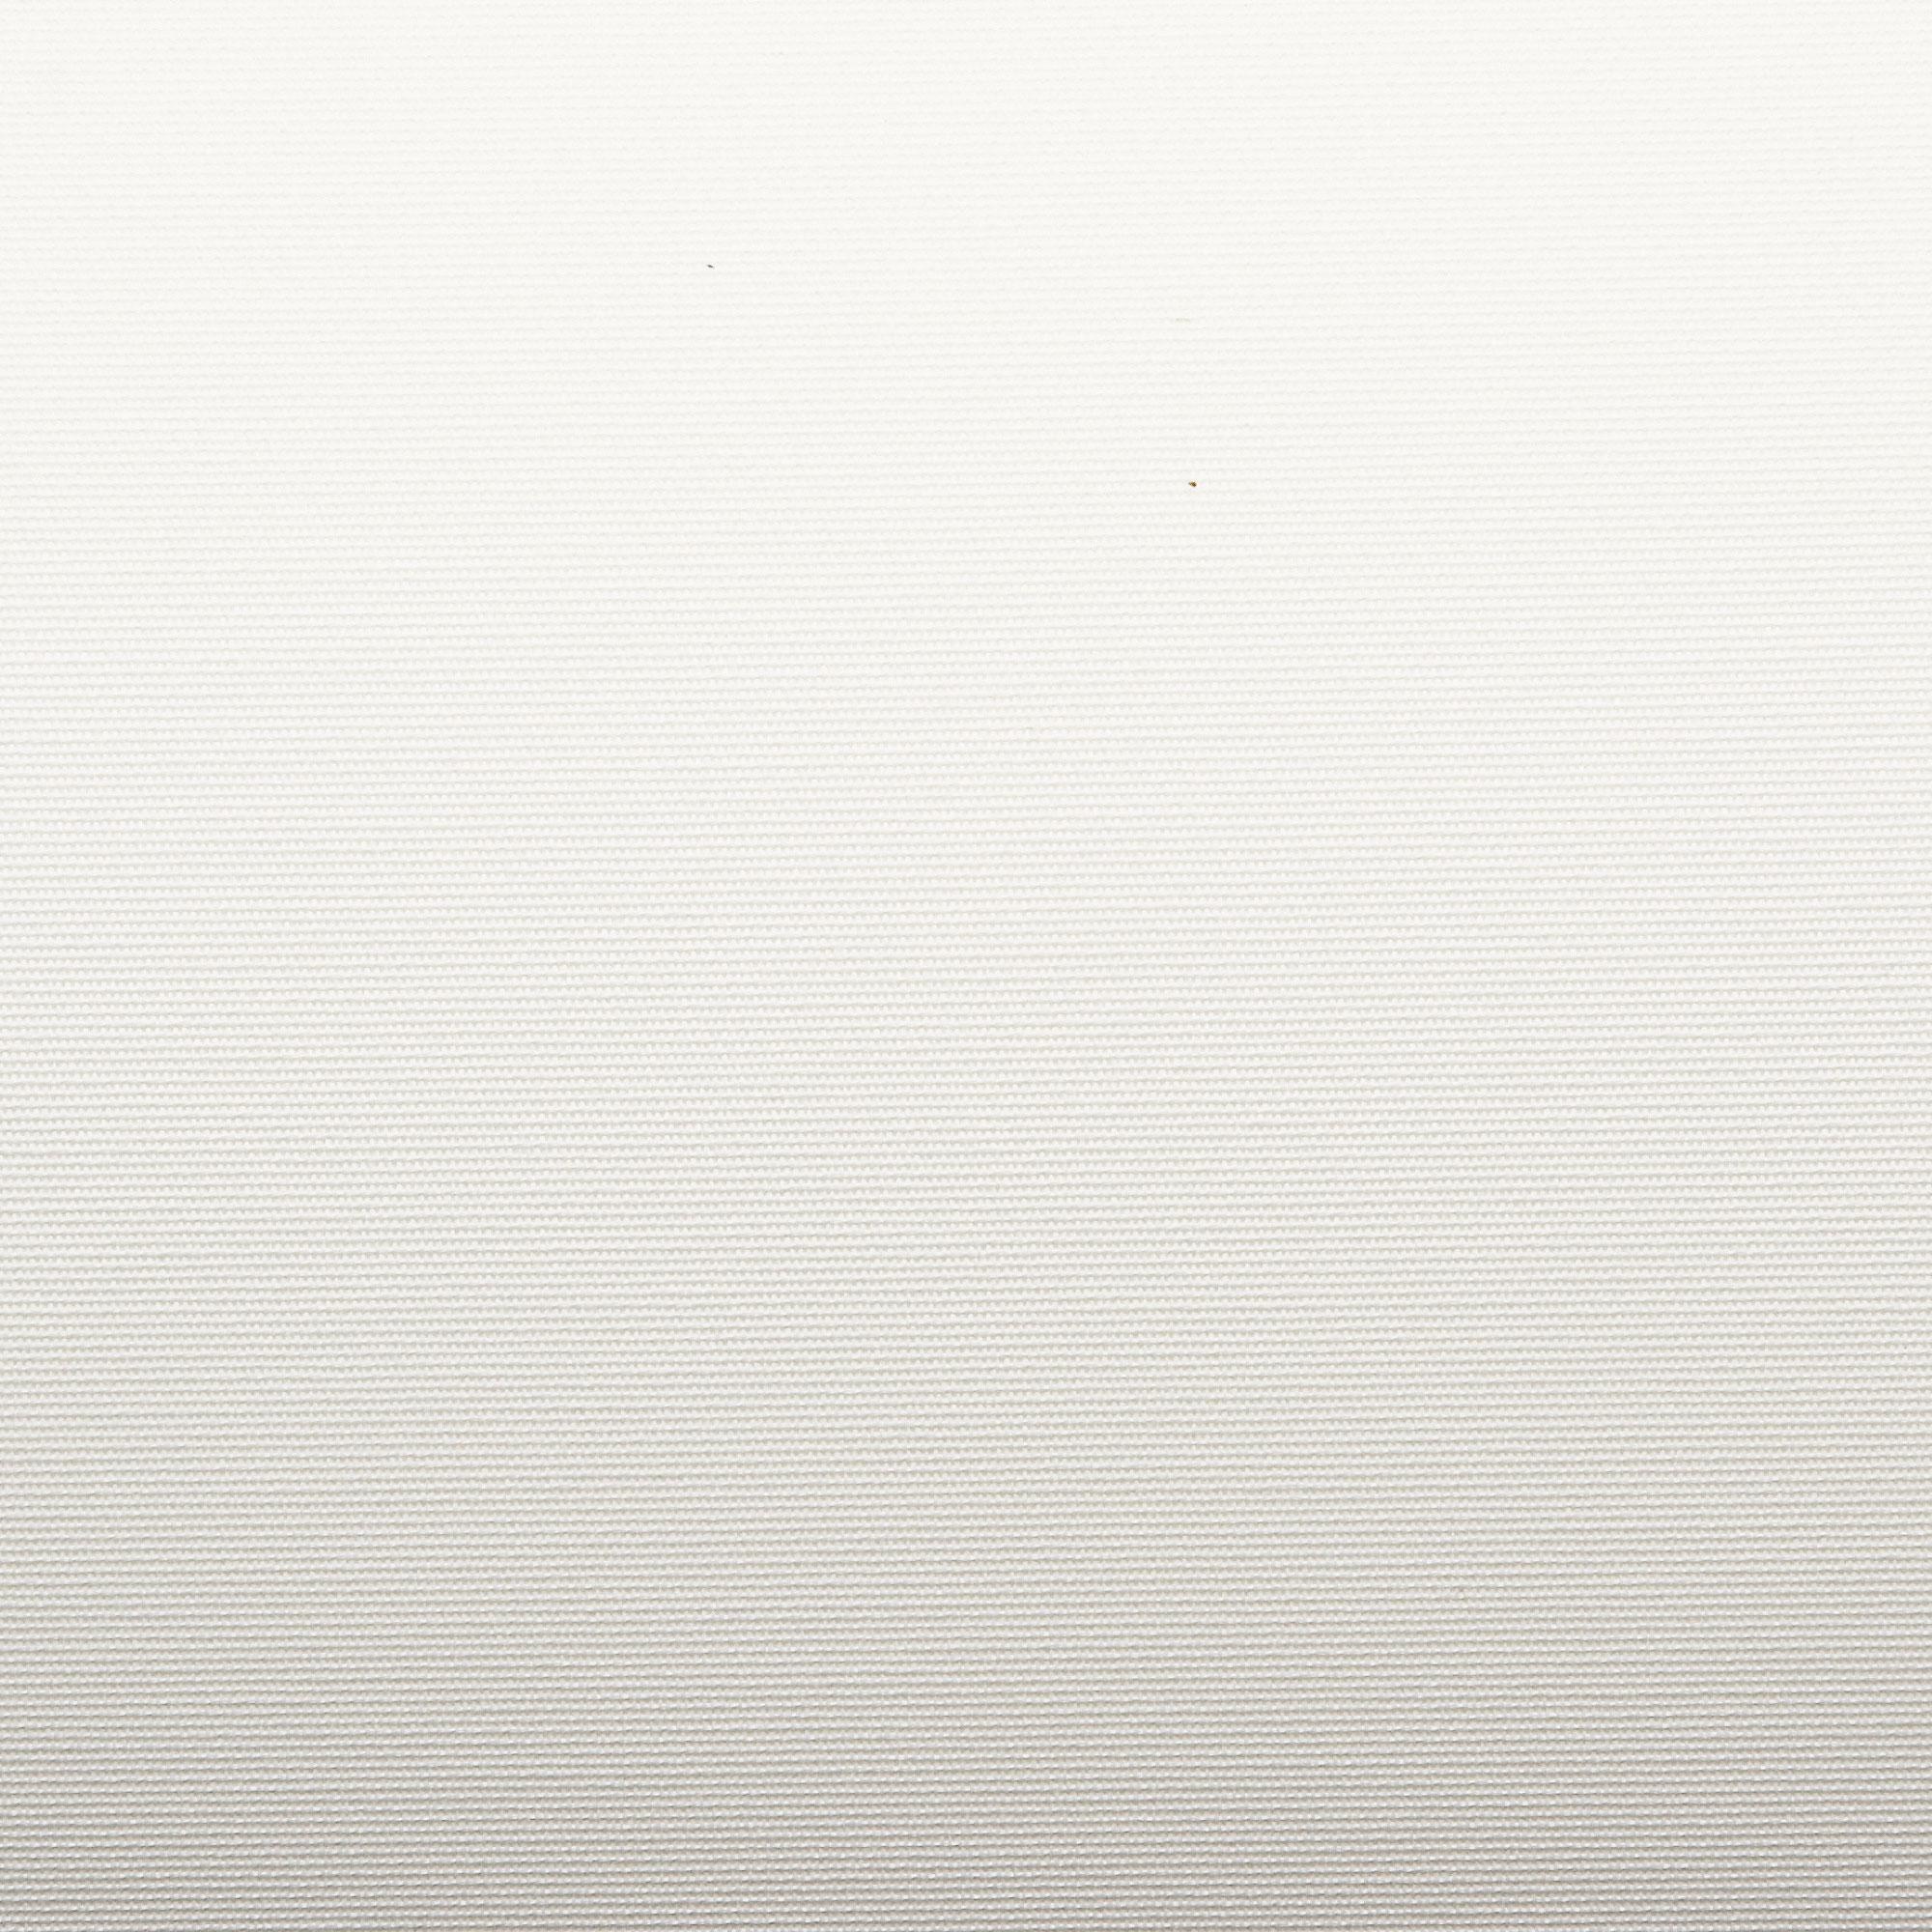 swatch-7000-p62-white-web.jpg